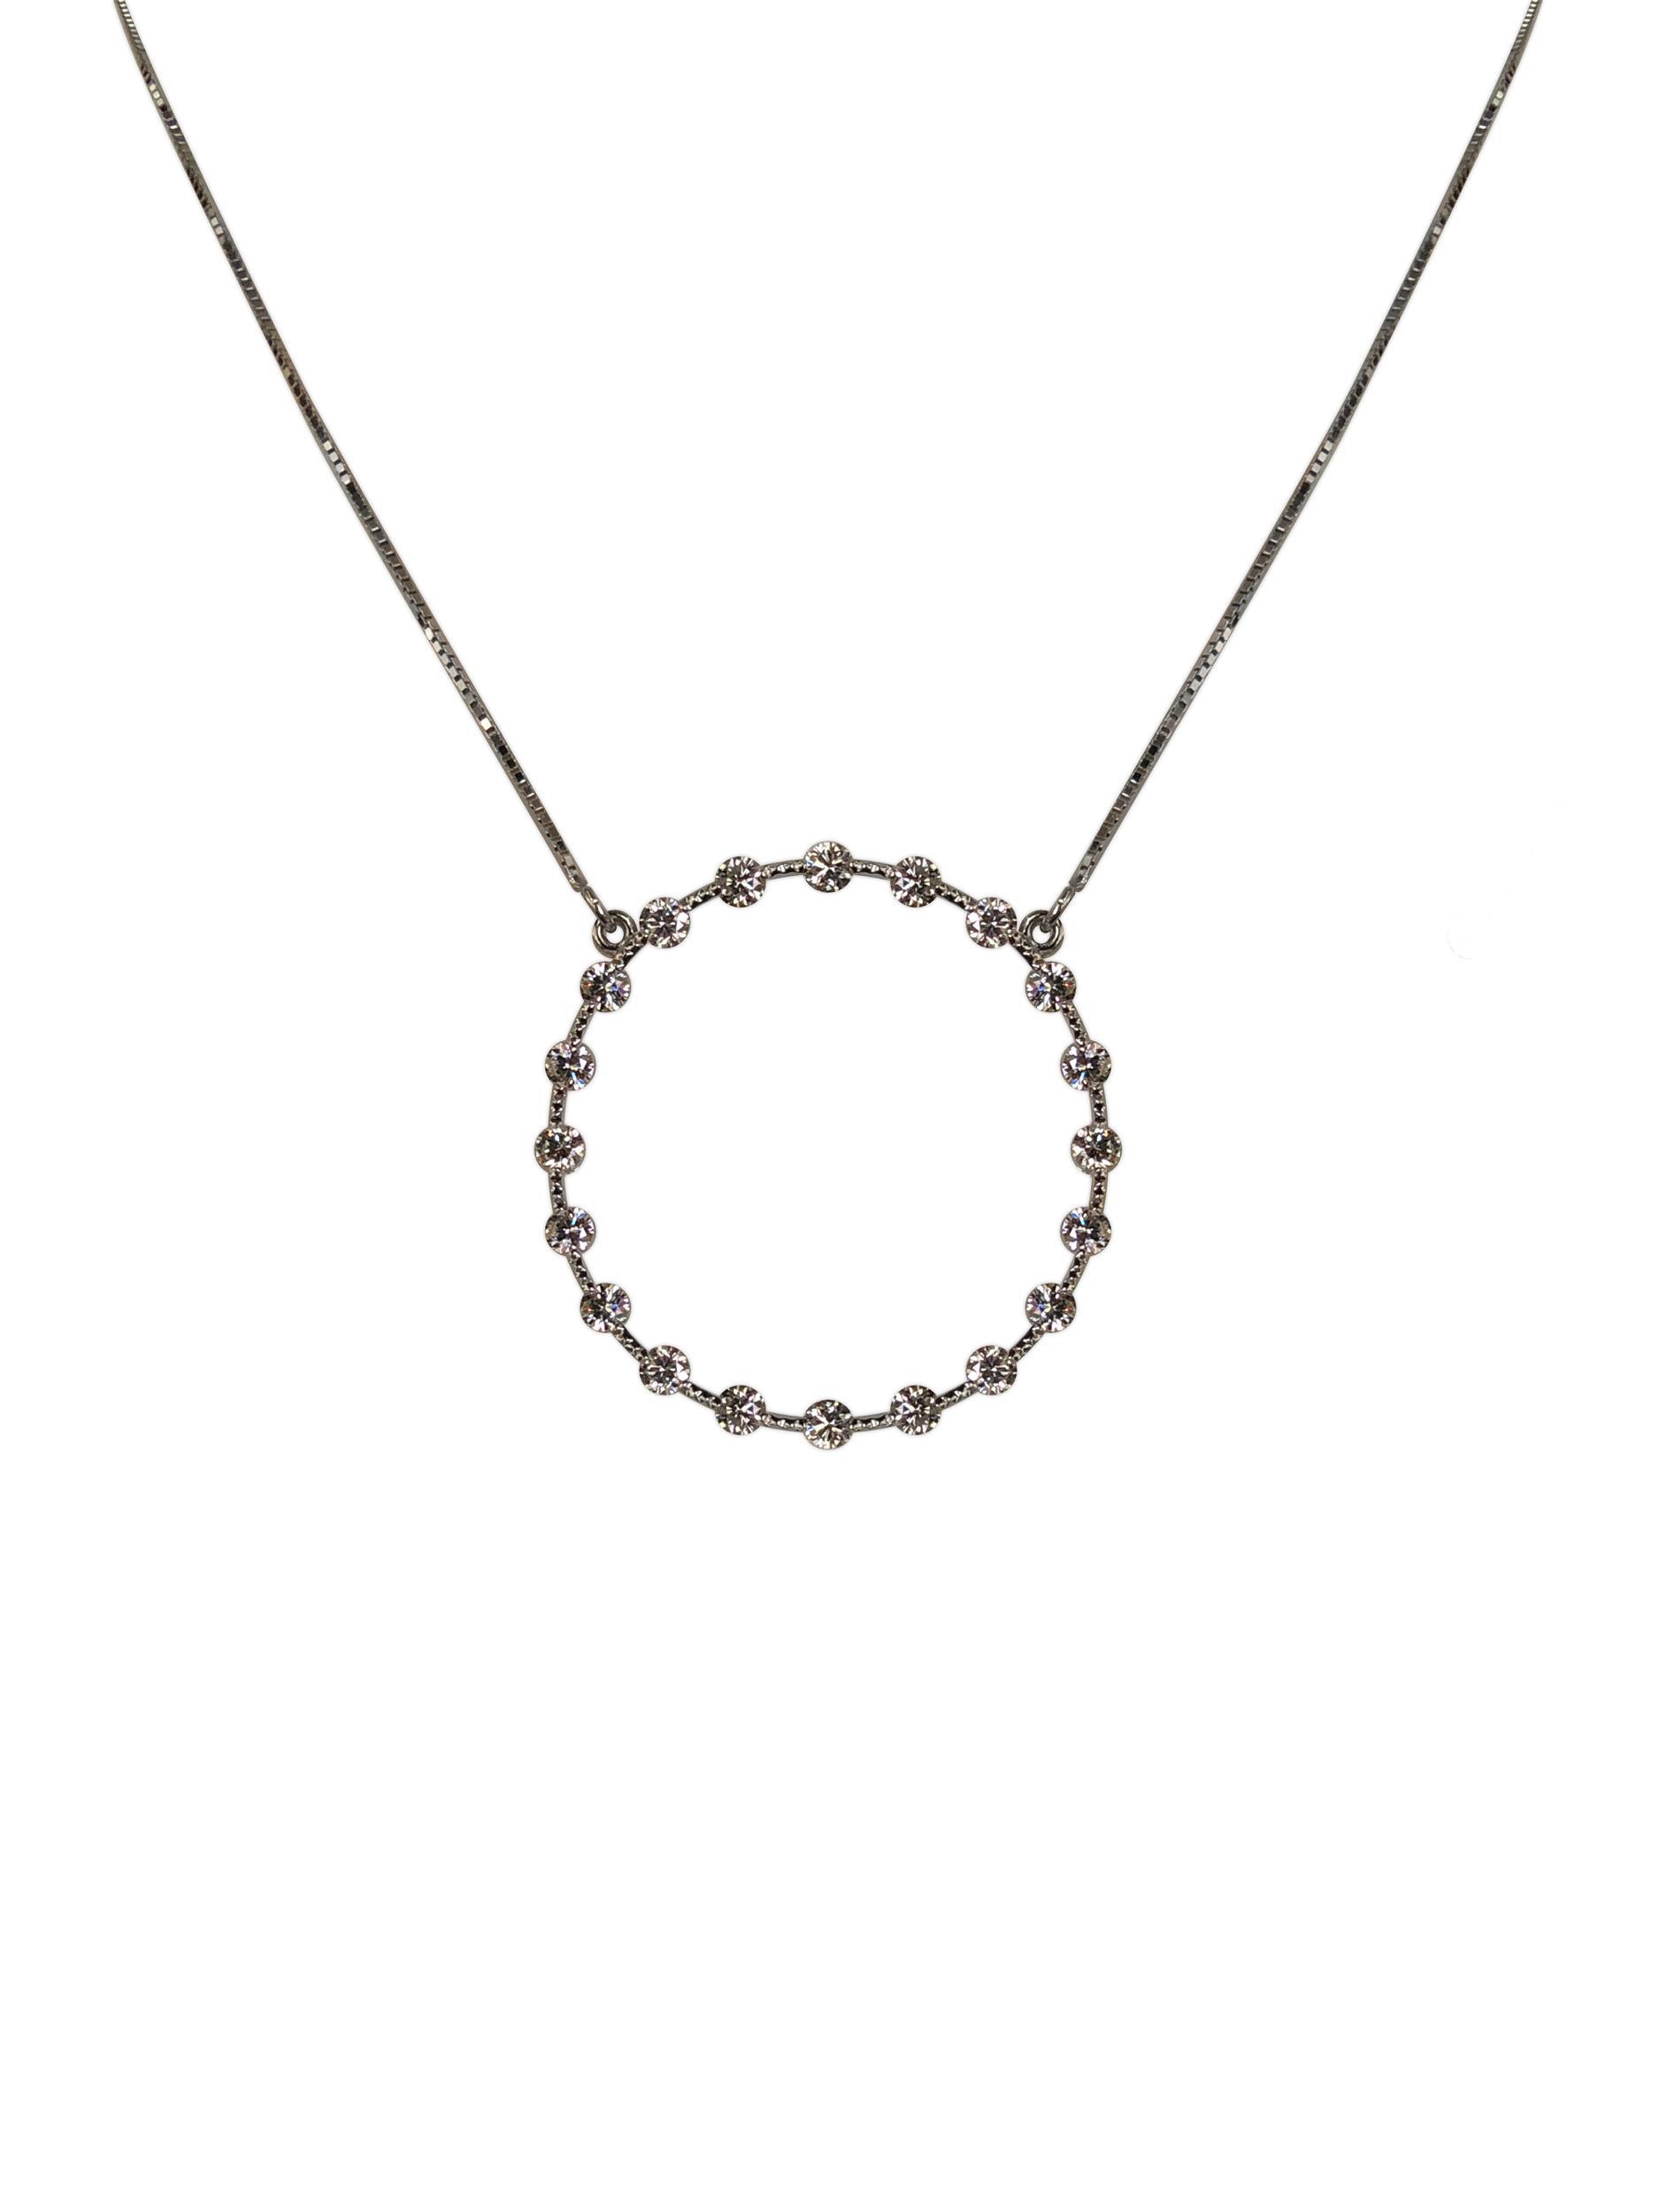 Drew Pietrafesa, Round Diamond Necklace, 2.4 Carat VS Diamonds, 18k White Gold Pendant